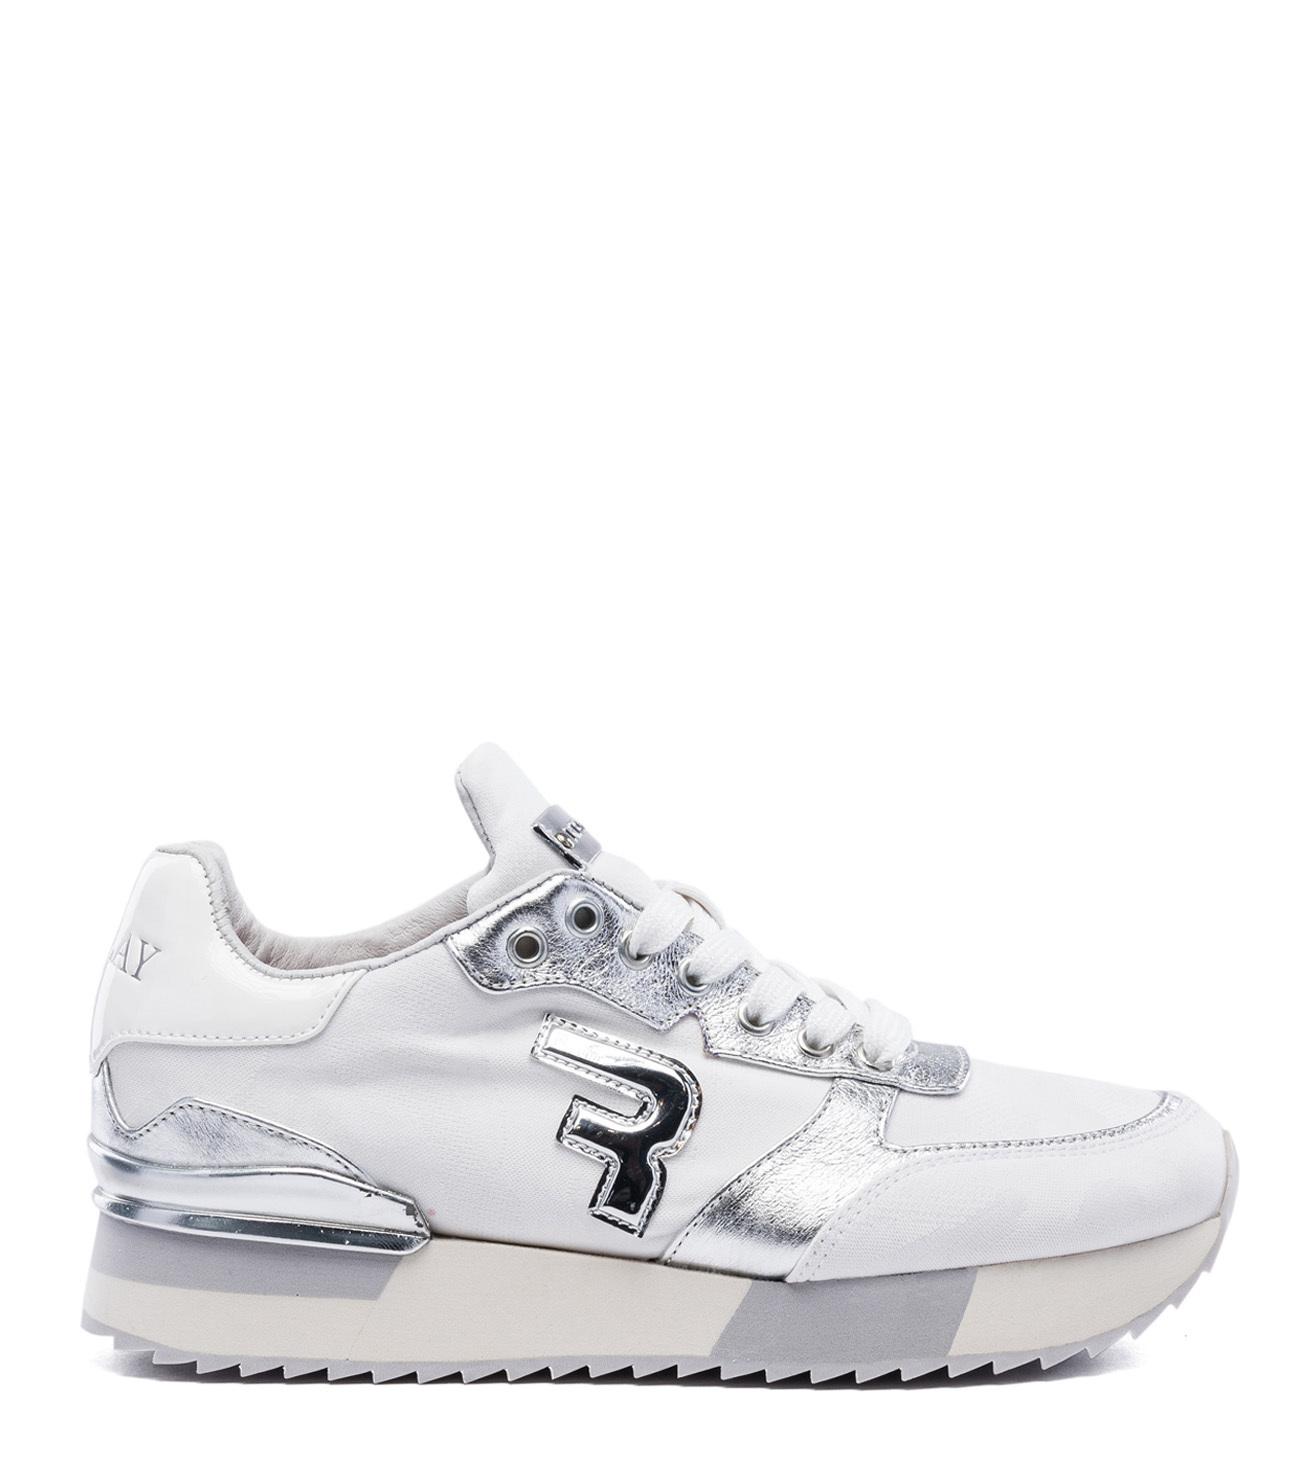 Women Sneakers Online @ Tata CLiQ Luxury